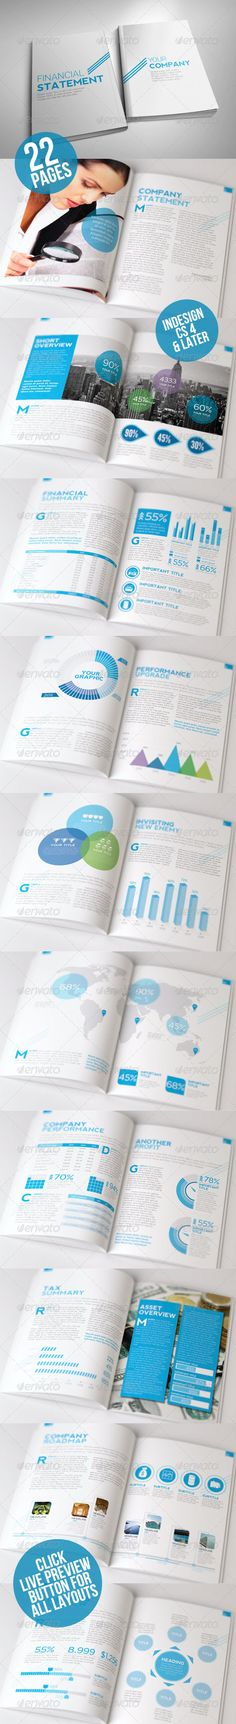 Desjardins Annual Report By Pierre Olivier S 233 Guin